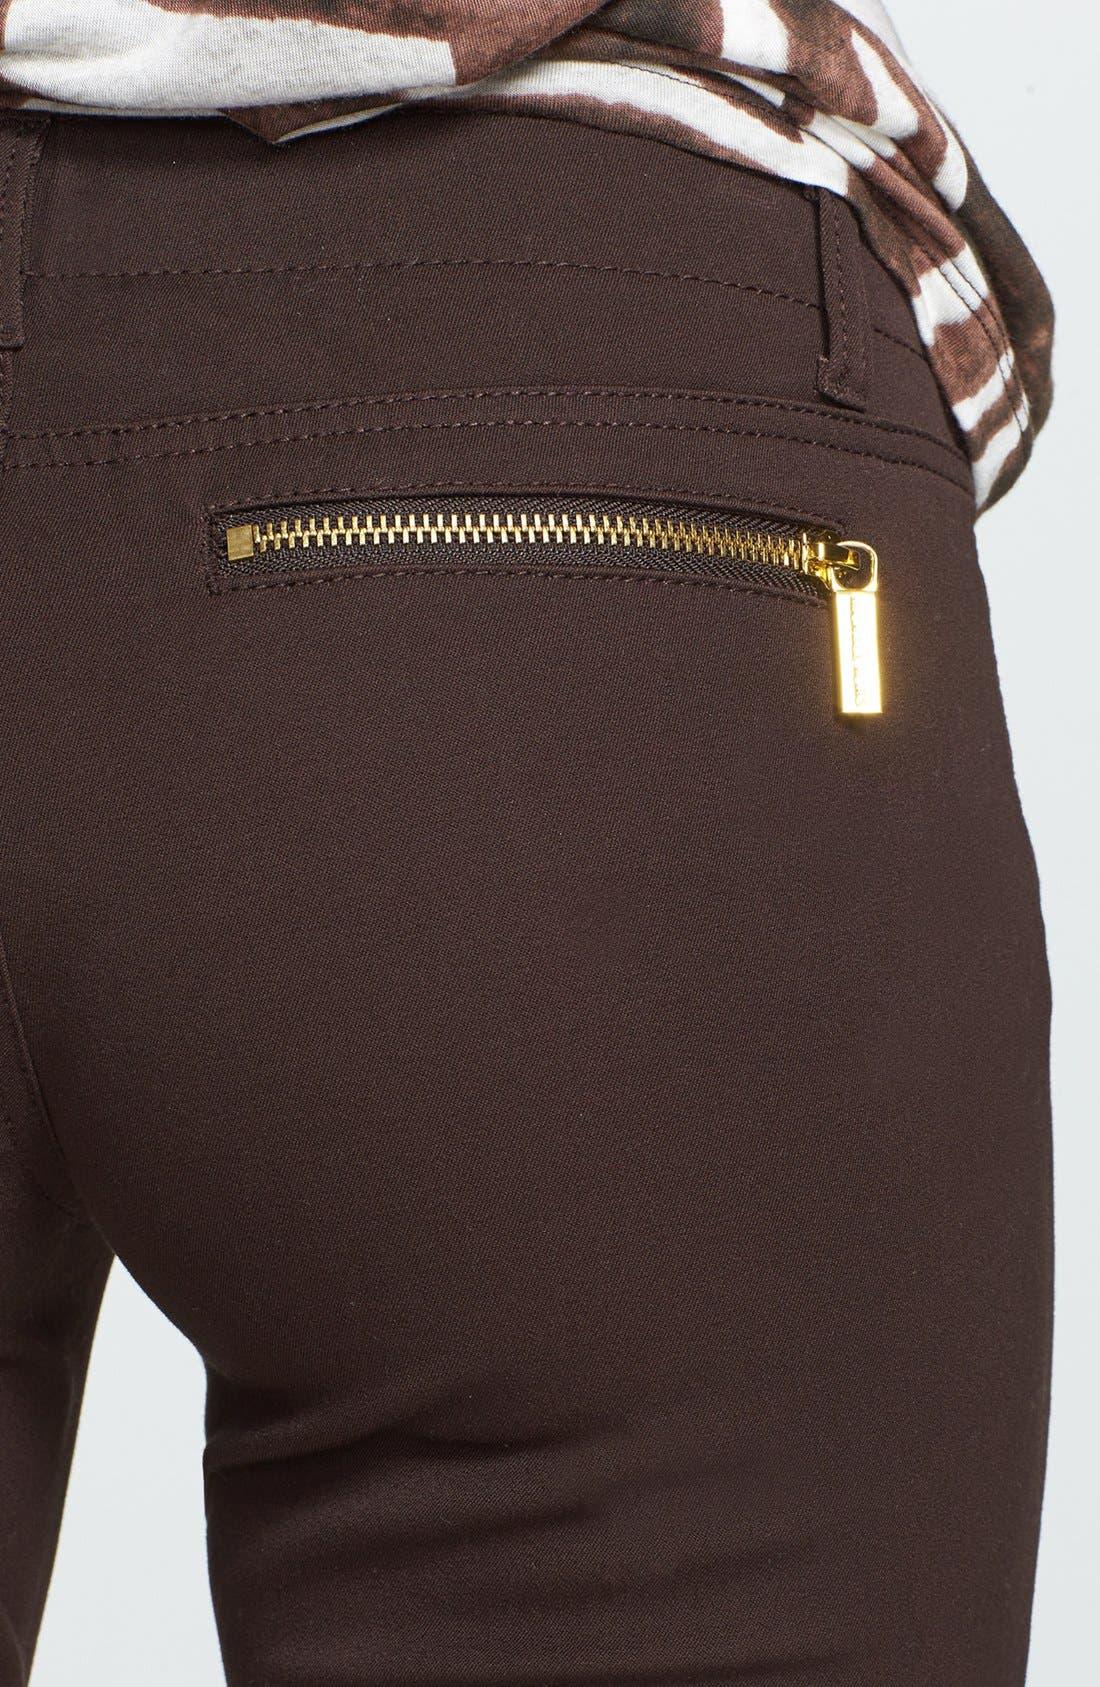 Alternate Image 3  - MICHAEL Michael Kors 'Rocker' Zip Twill Pants